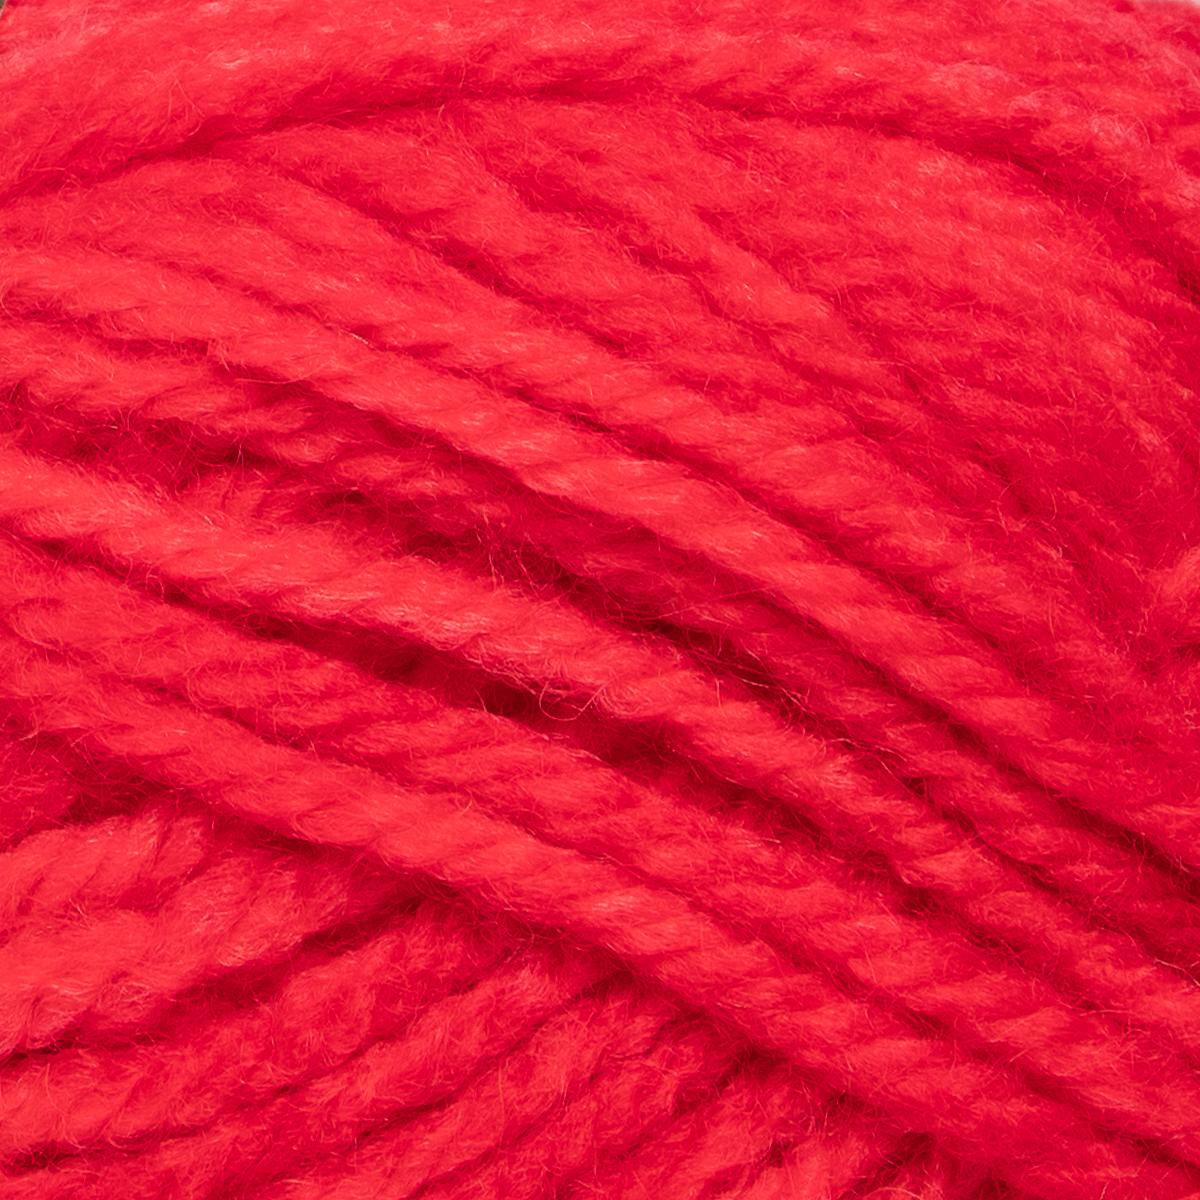 3pk-Lion-Brand-Yarn-Acrylic-amp-Wool-Chunky-Yarn-Bulky-5-Soft-Knitting-Crocheting thumbnail 18